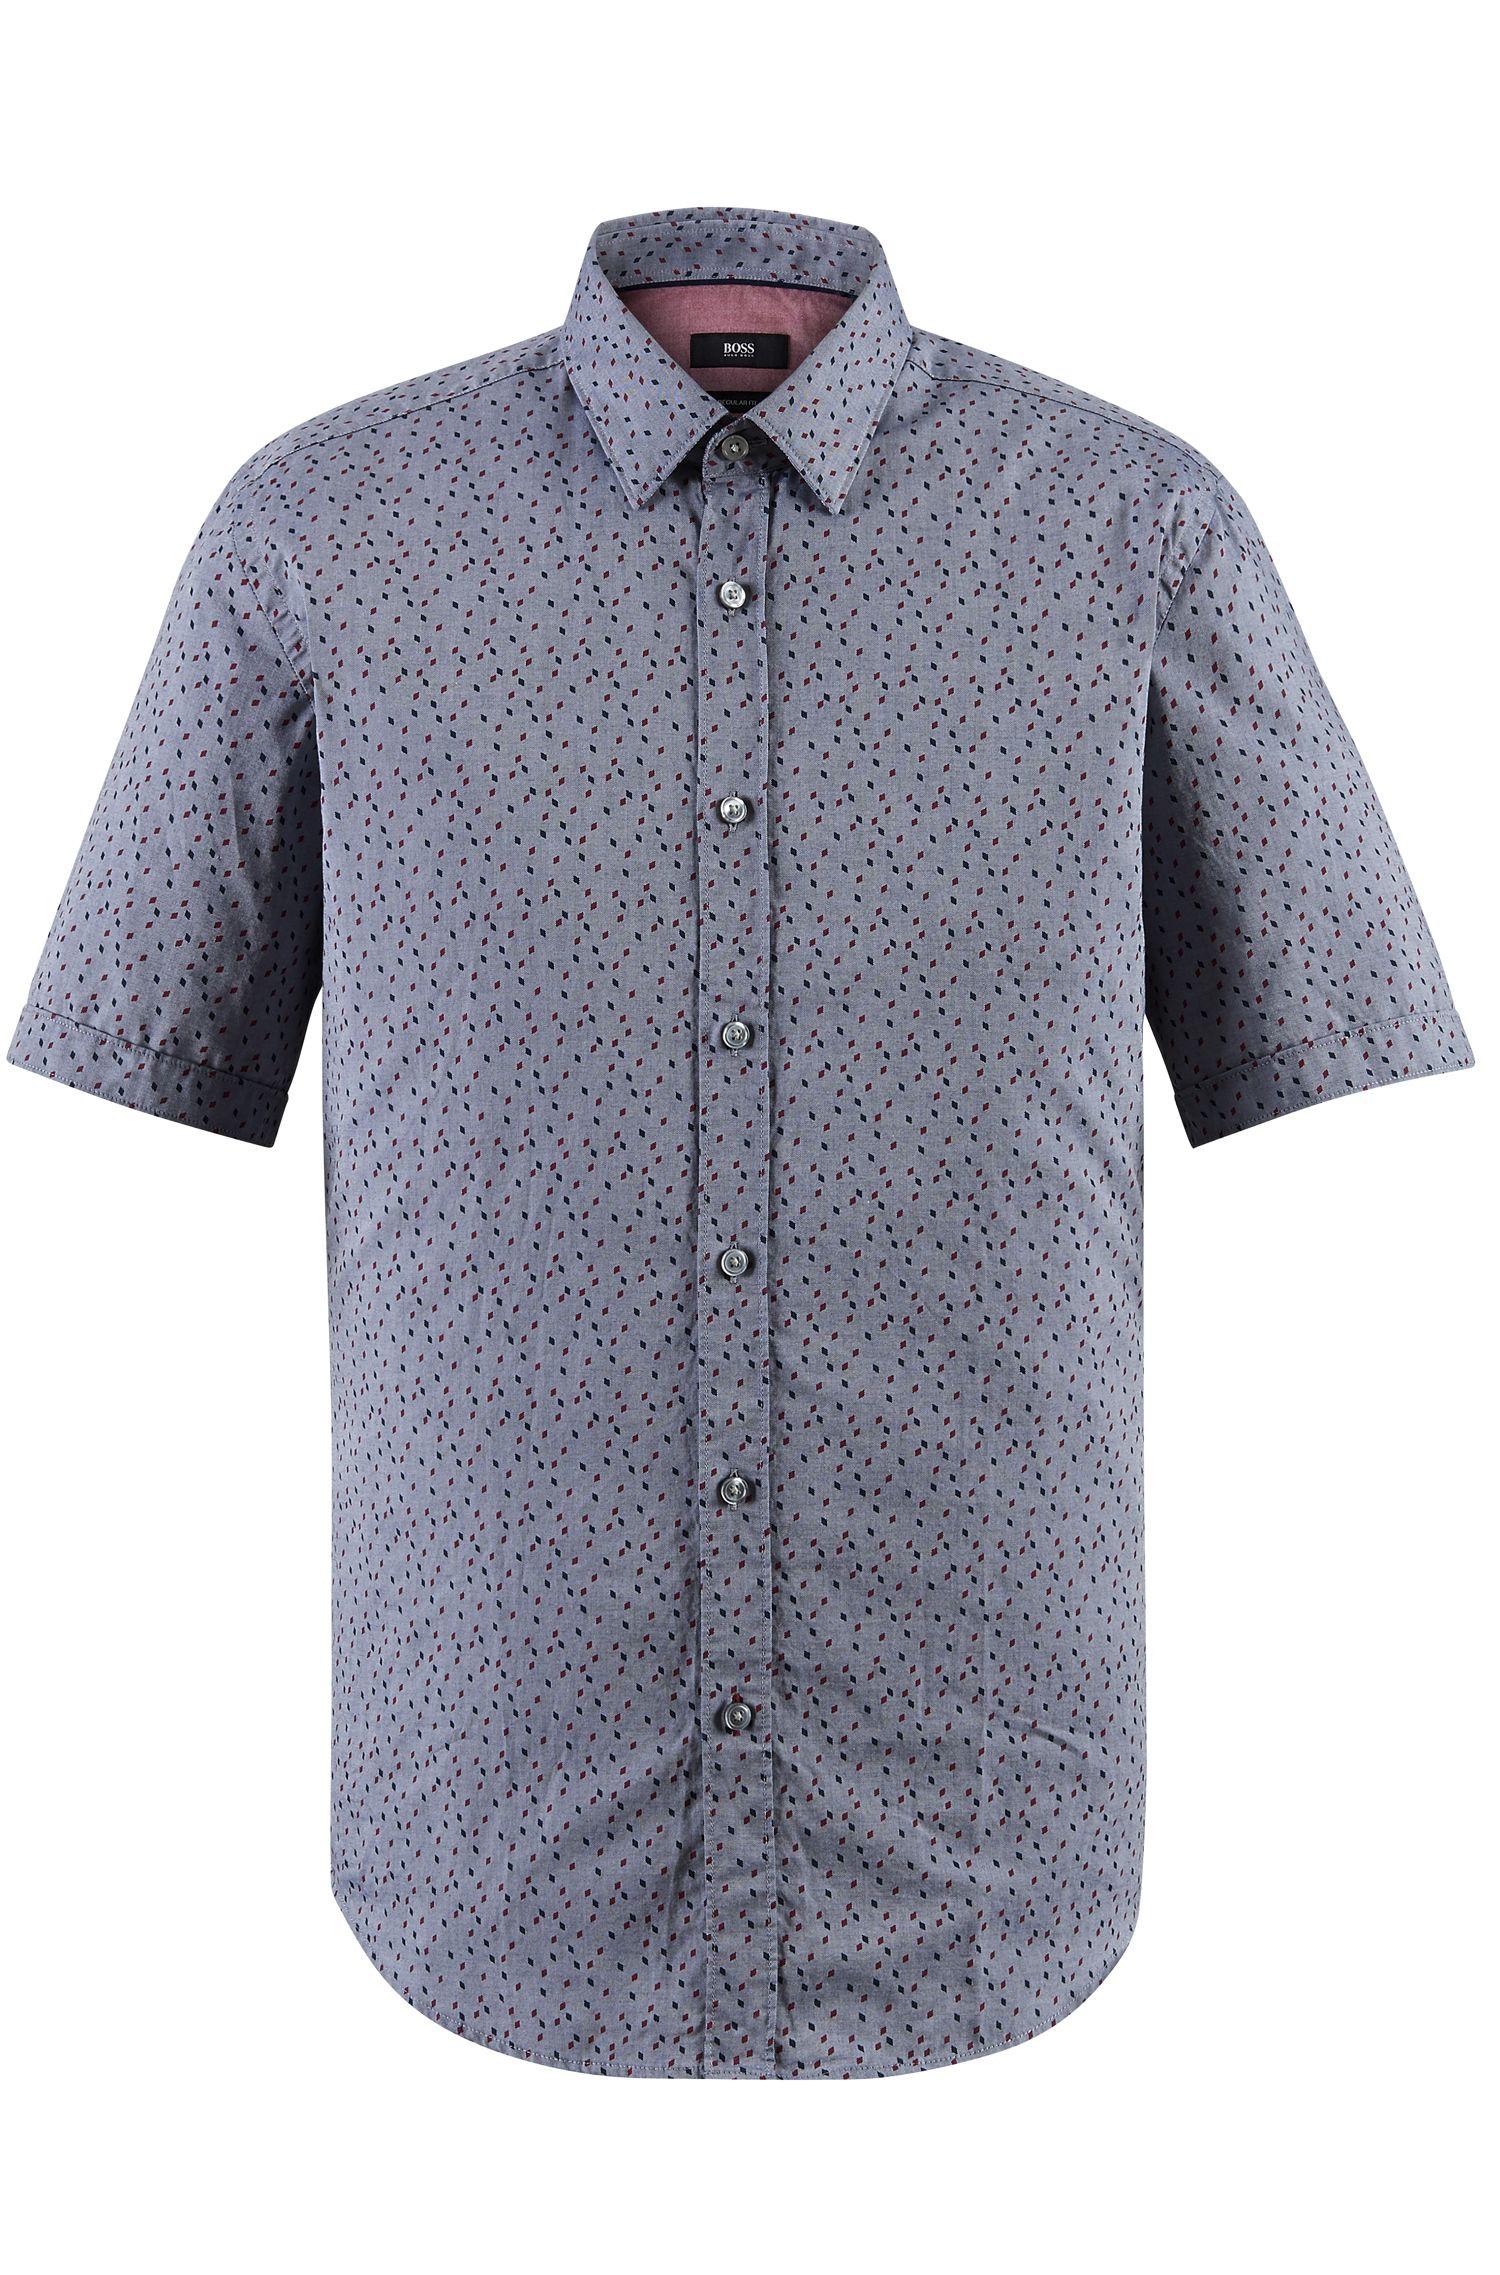 Patterned Cotton Button Down Shirt Regular Fit   Lukas